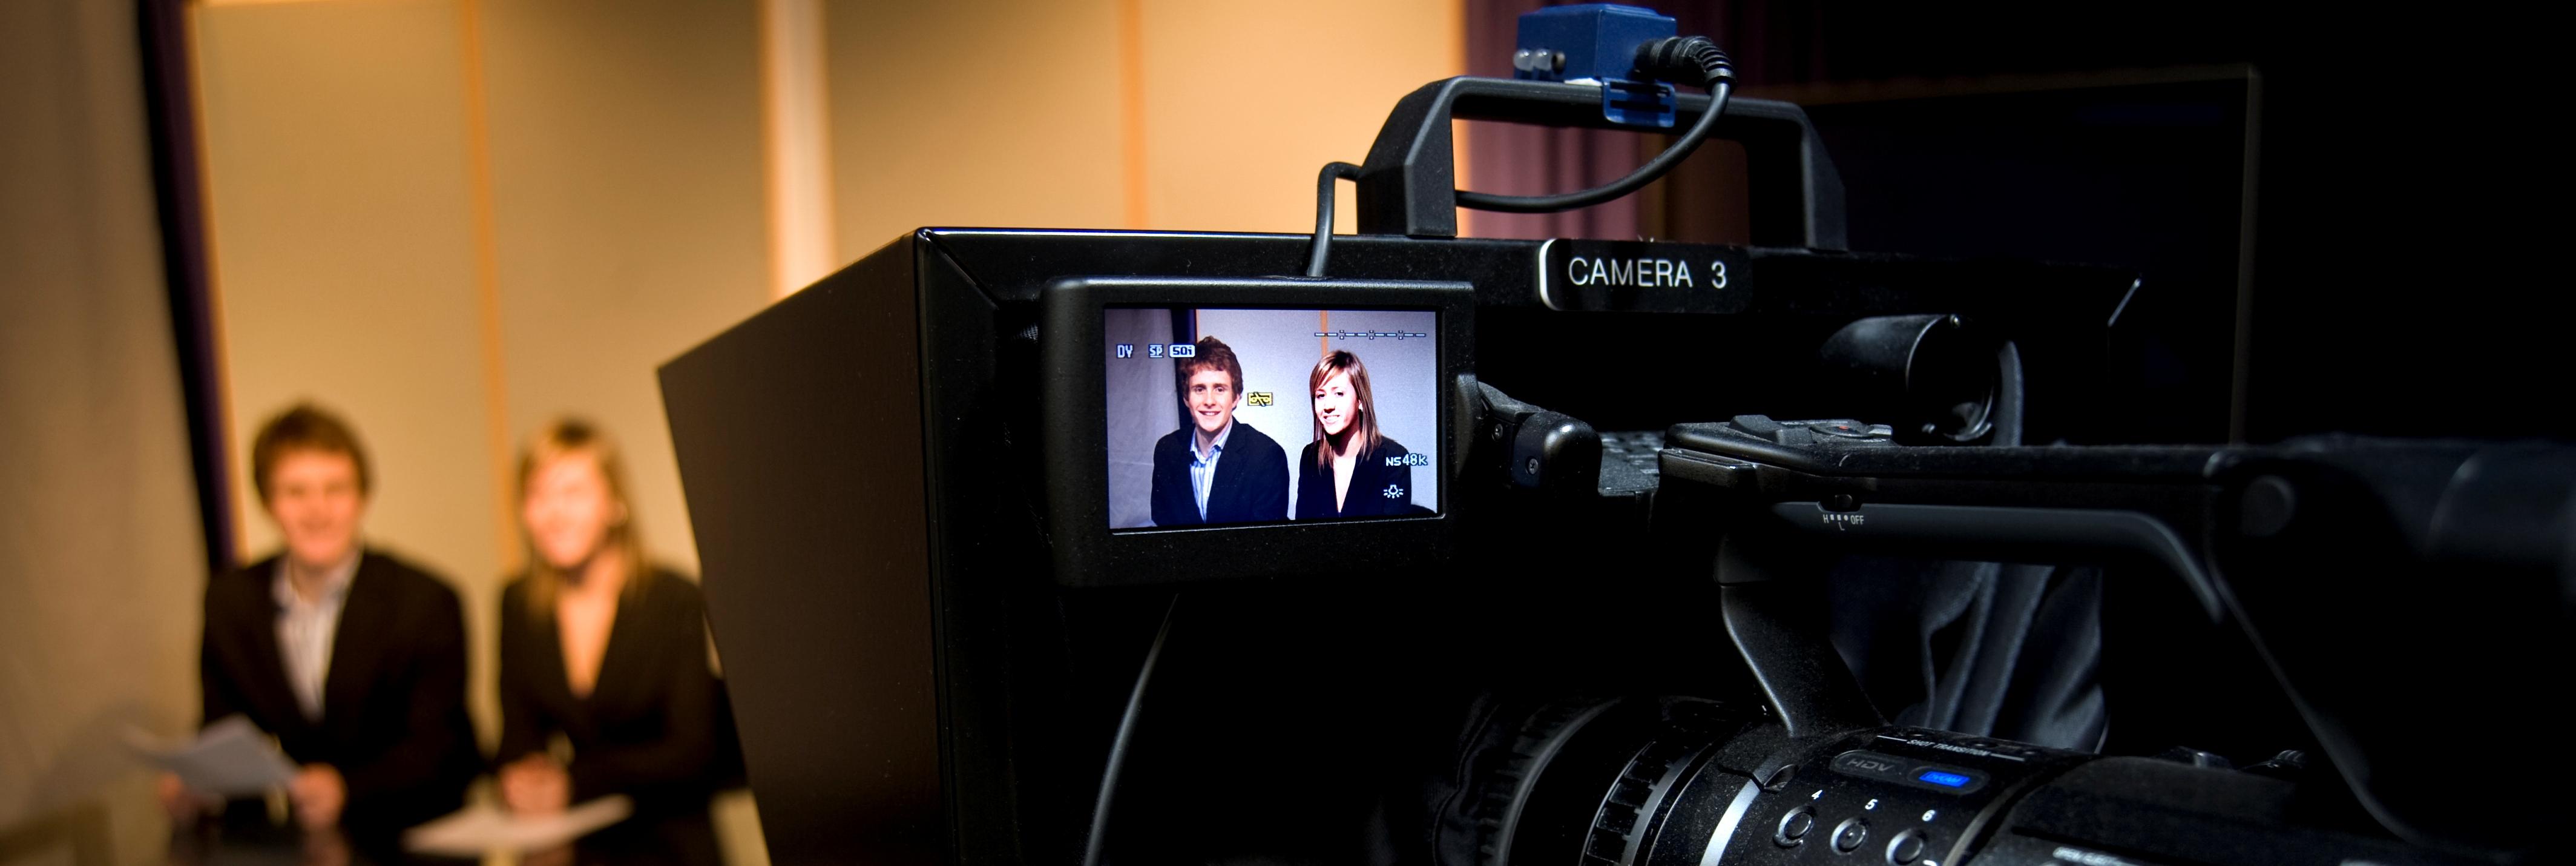 tv-studio-ba-students-13.jpg